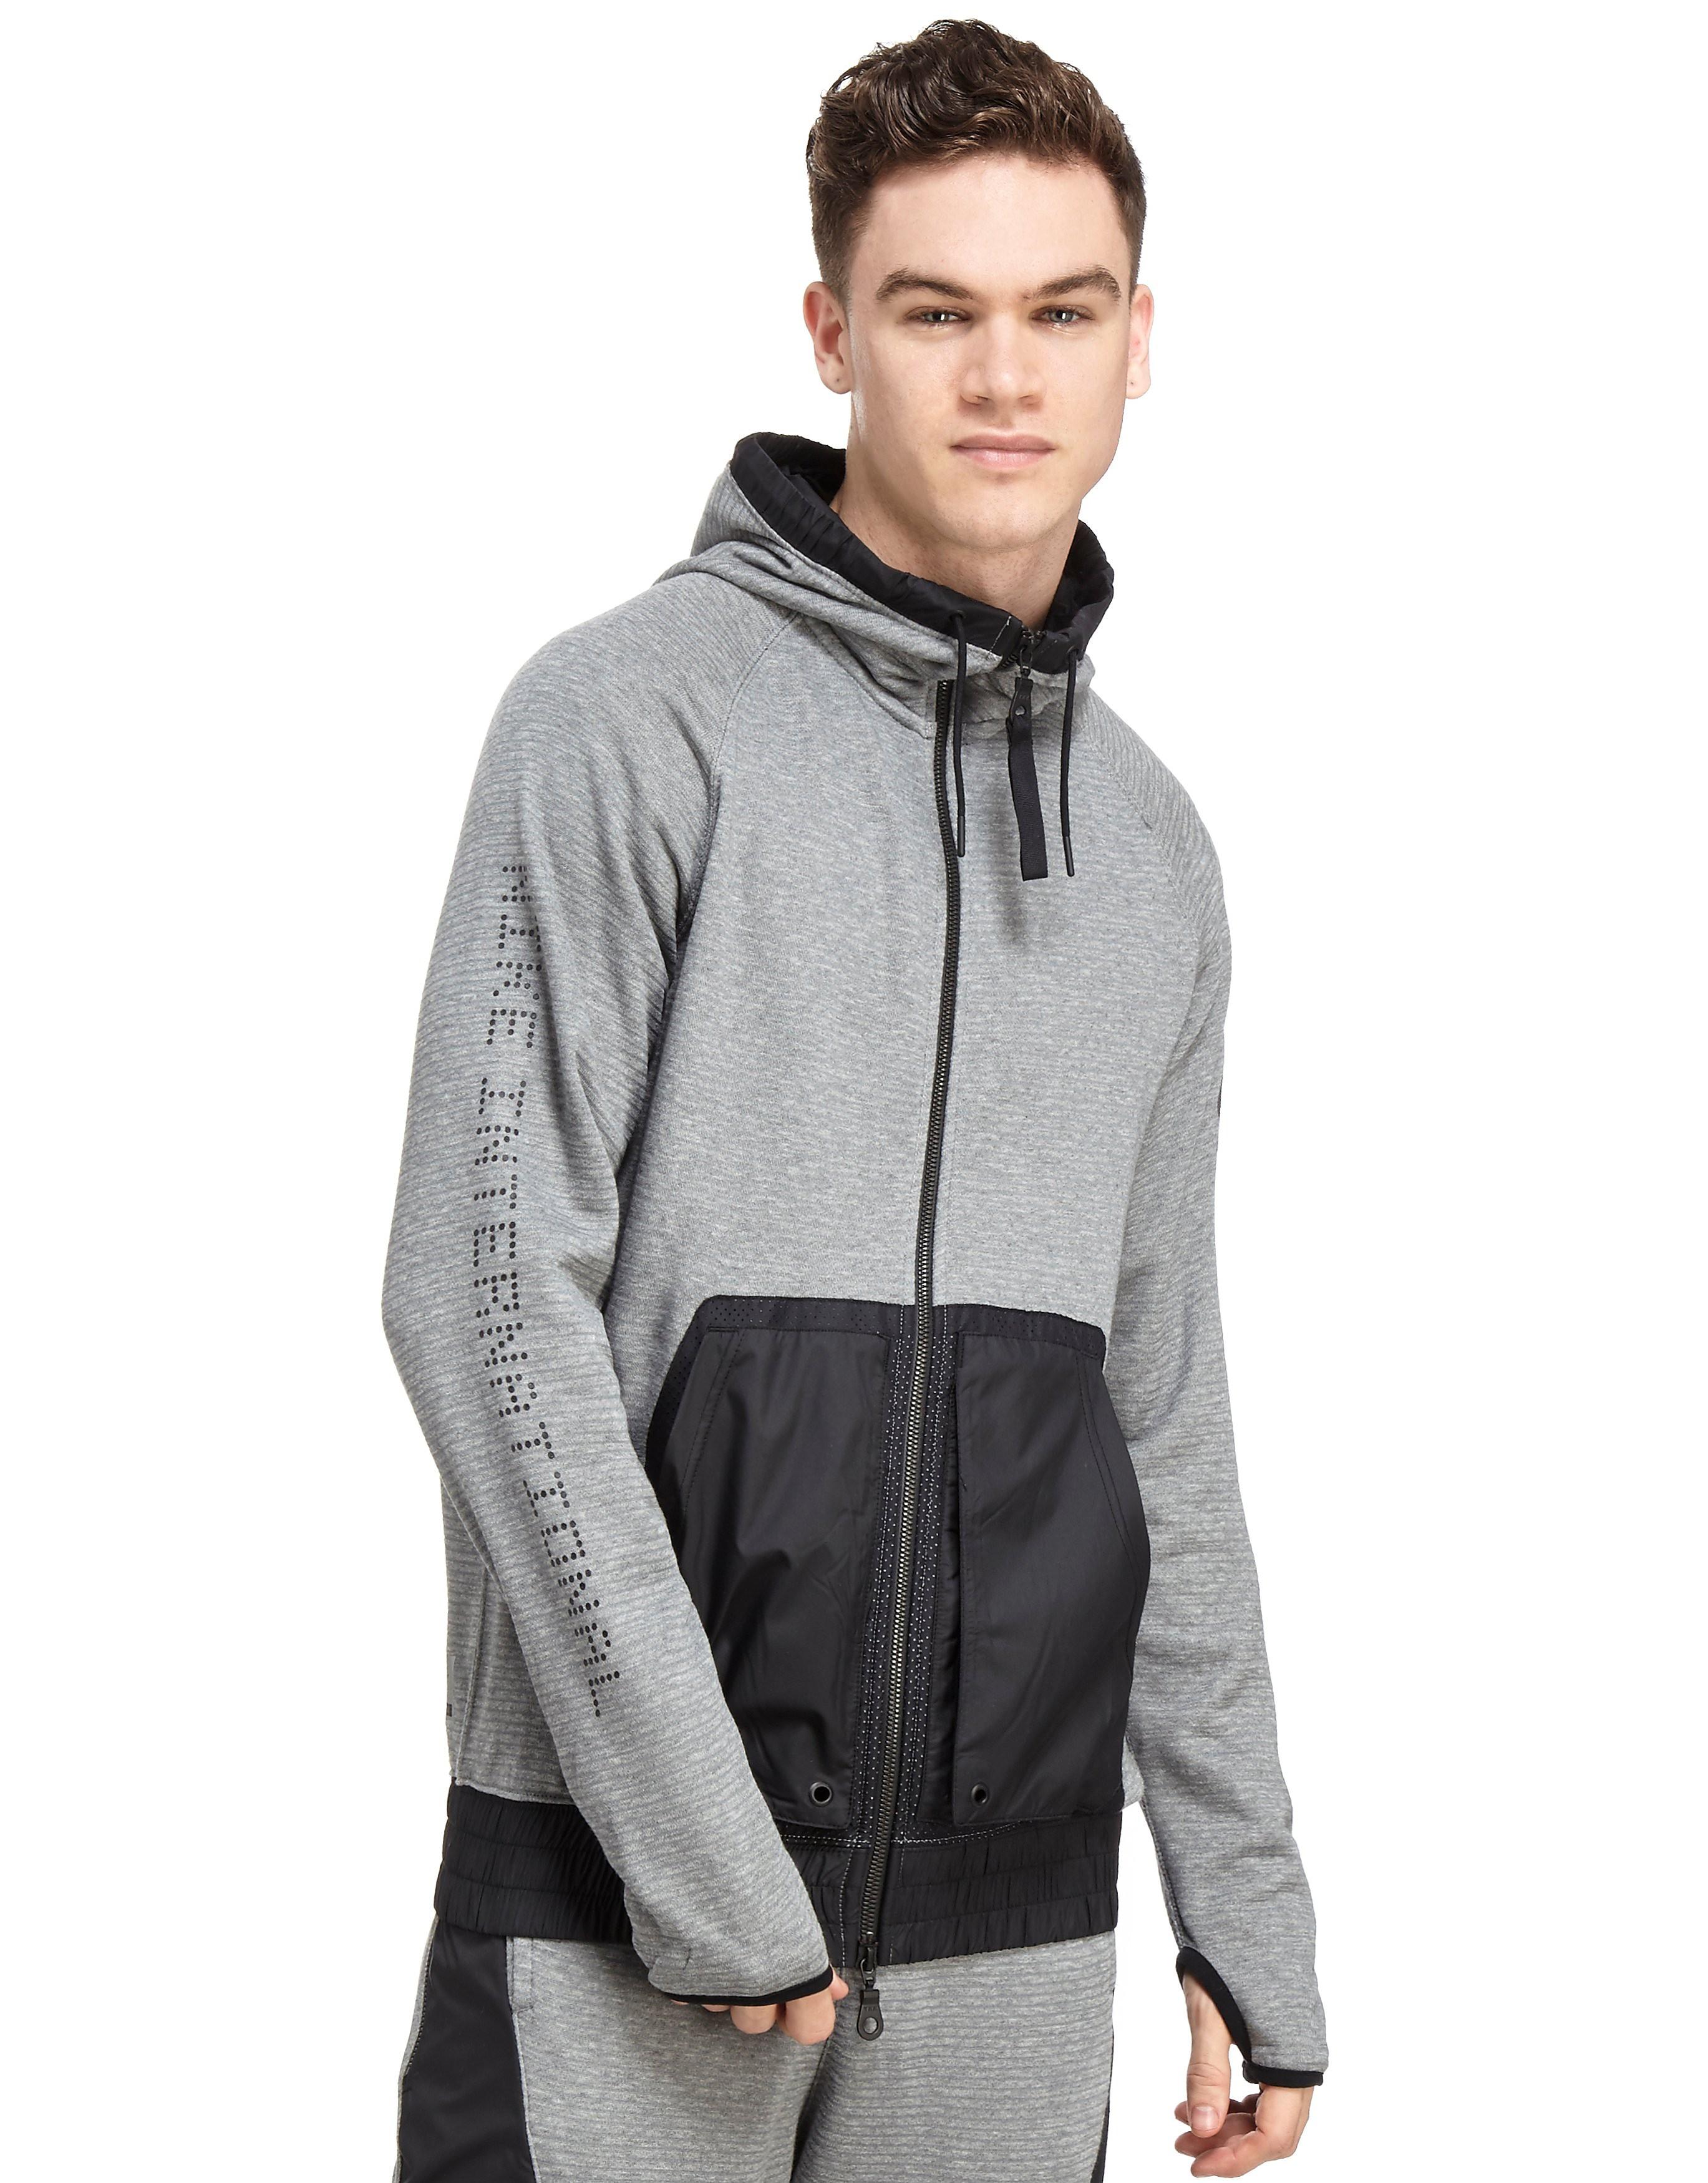 Nike International Full Zip Hoody